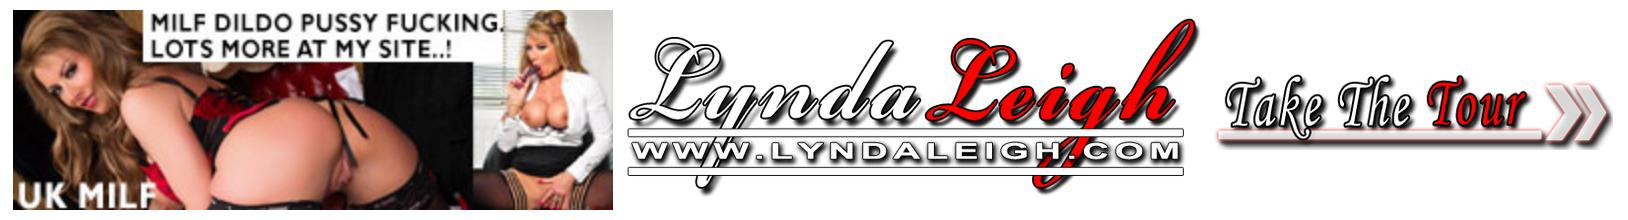 Lynda Leigh official website